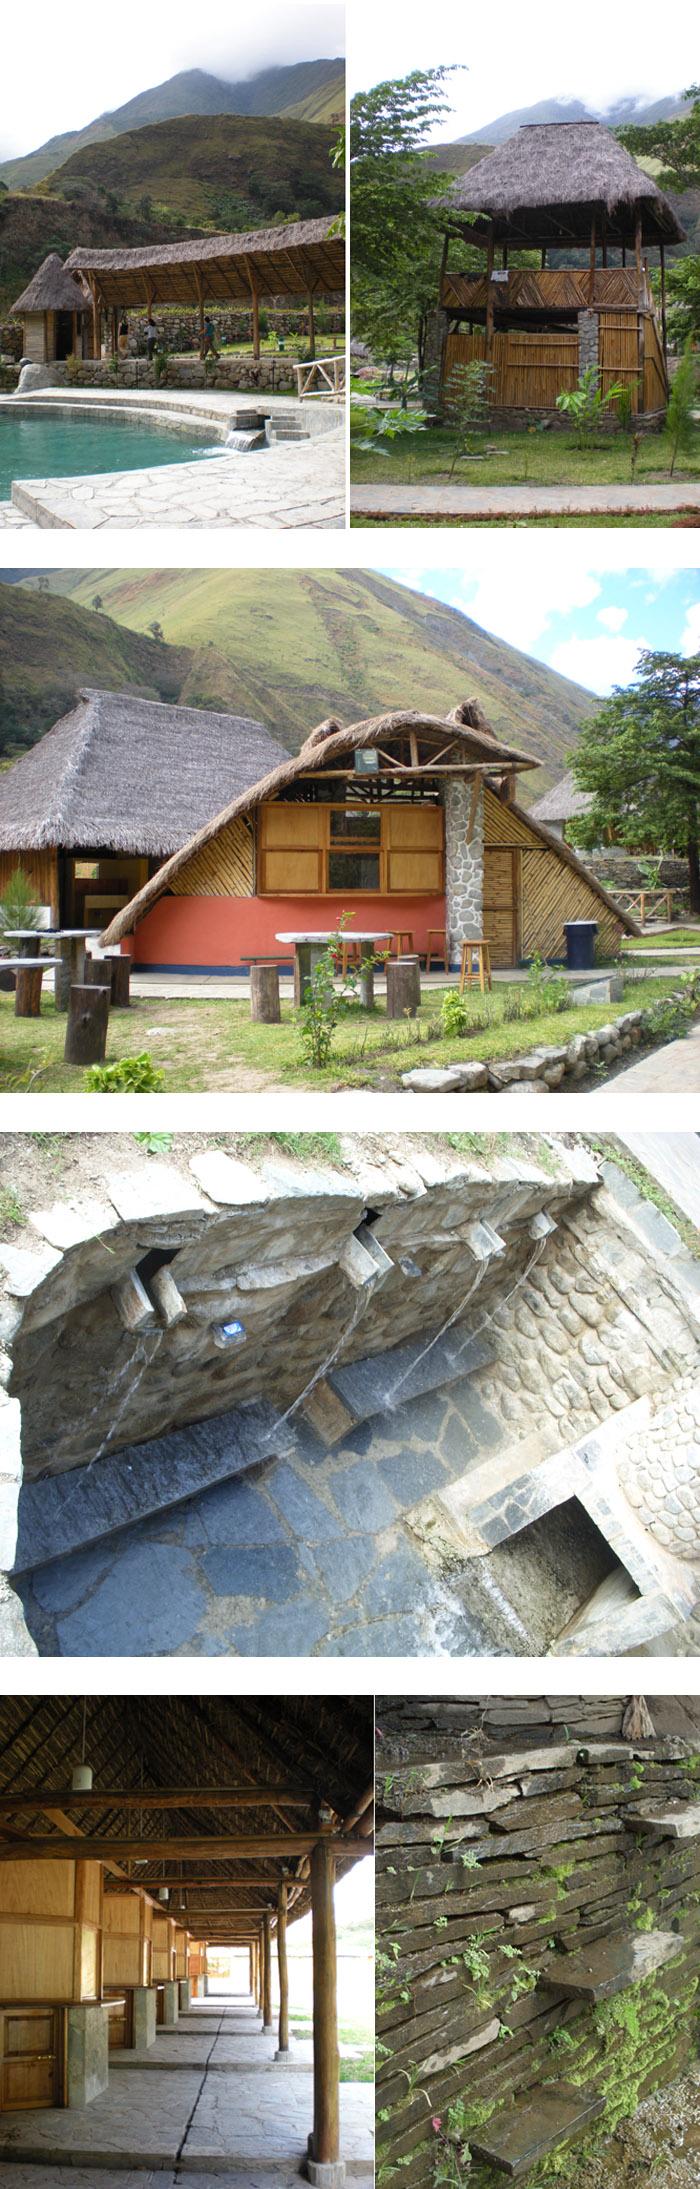 Hot spring center